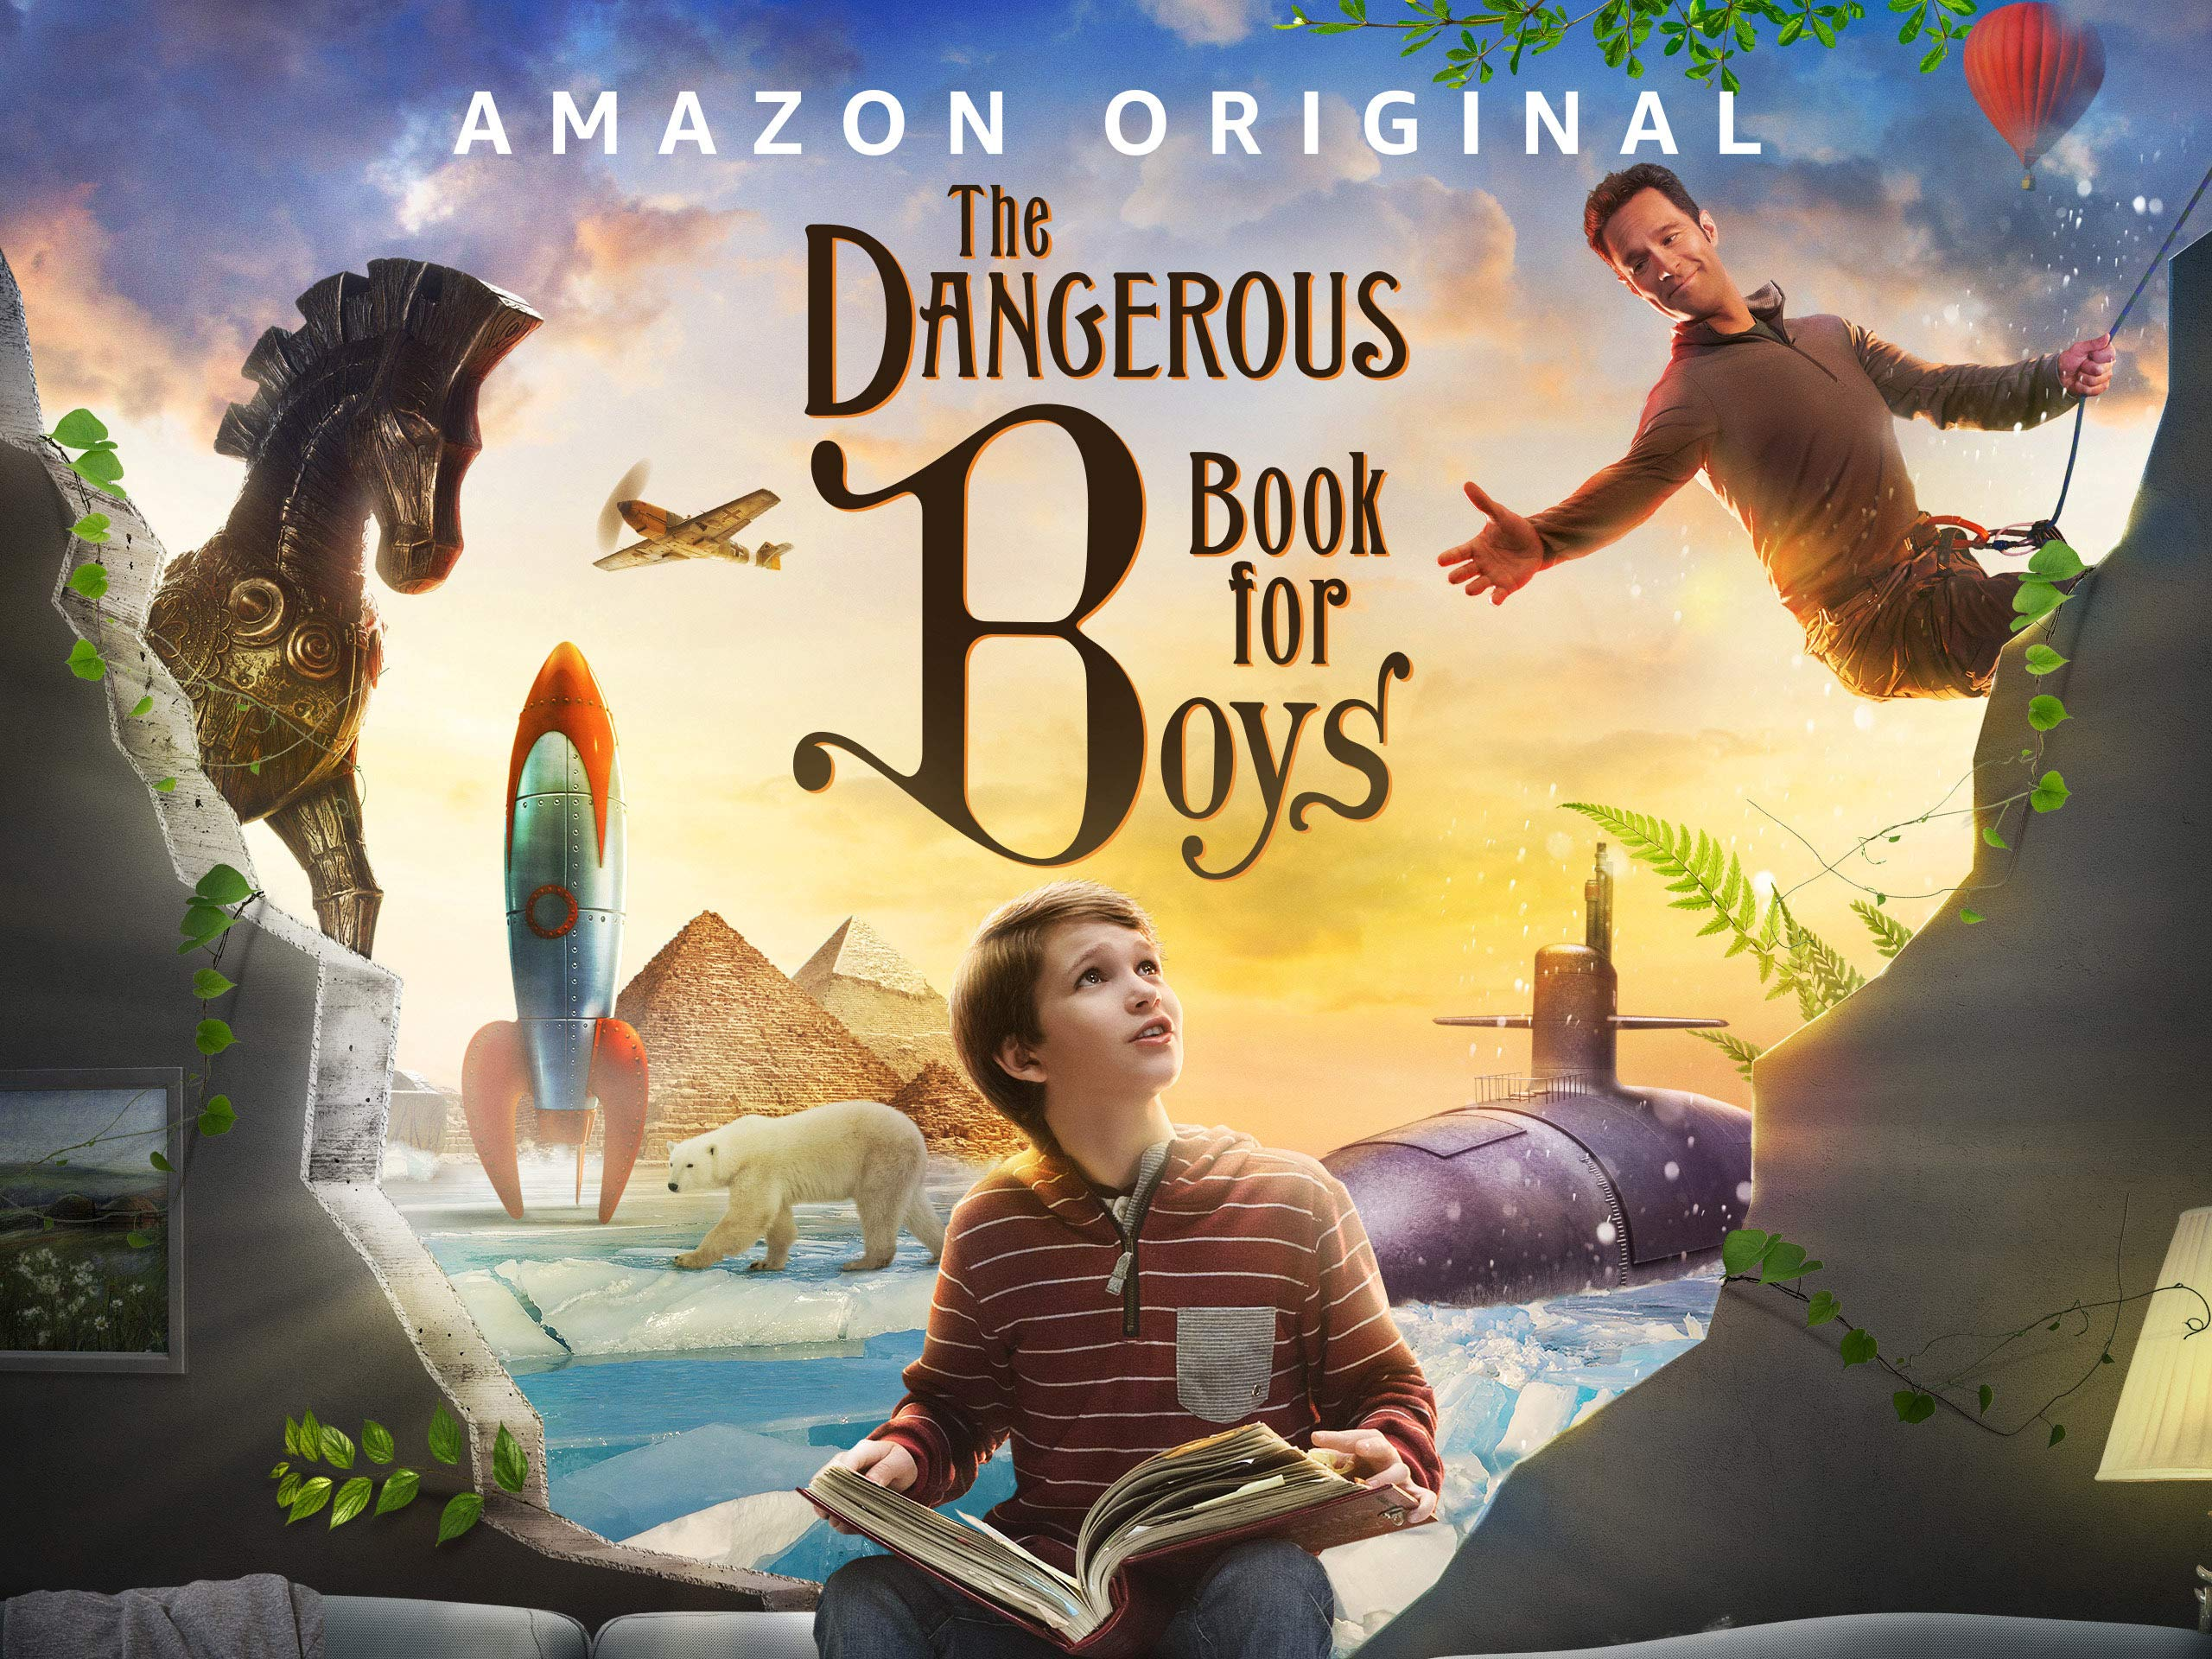 Amazon.com: Watch The Dangerous Book for Boys - Season 1 | Prime Video